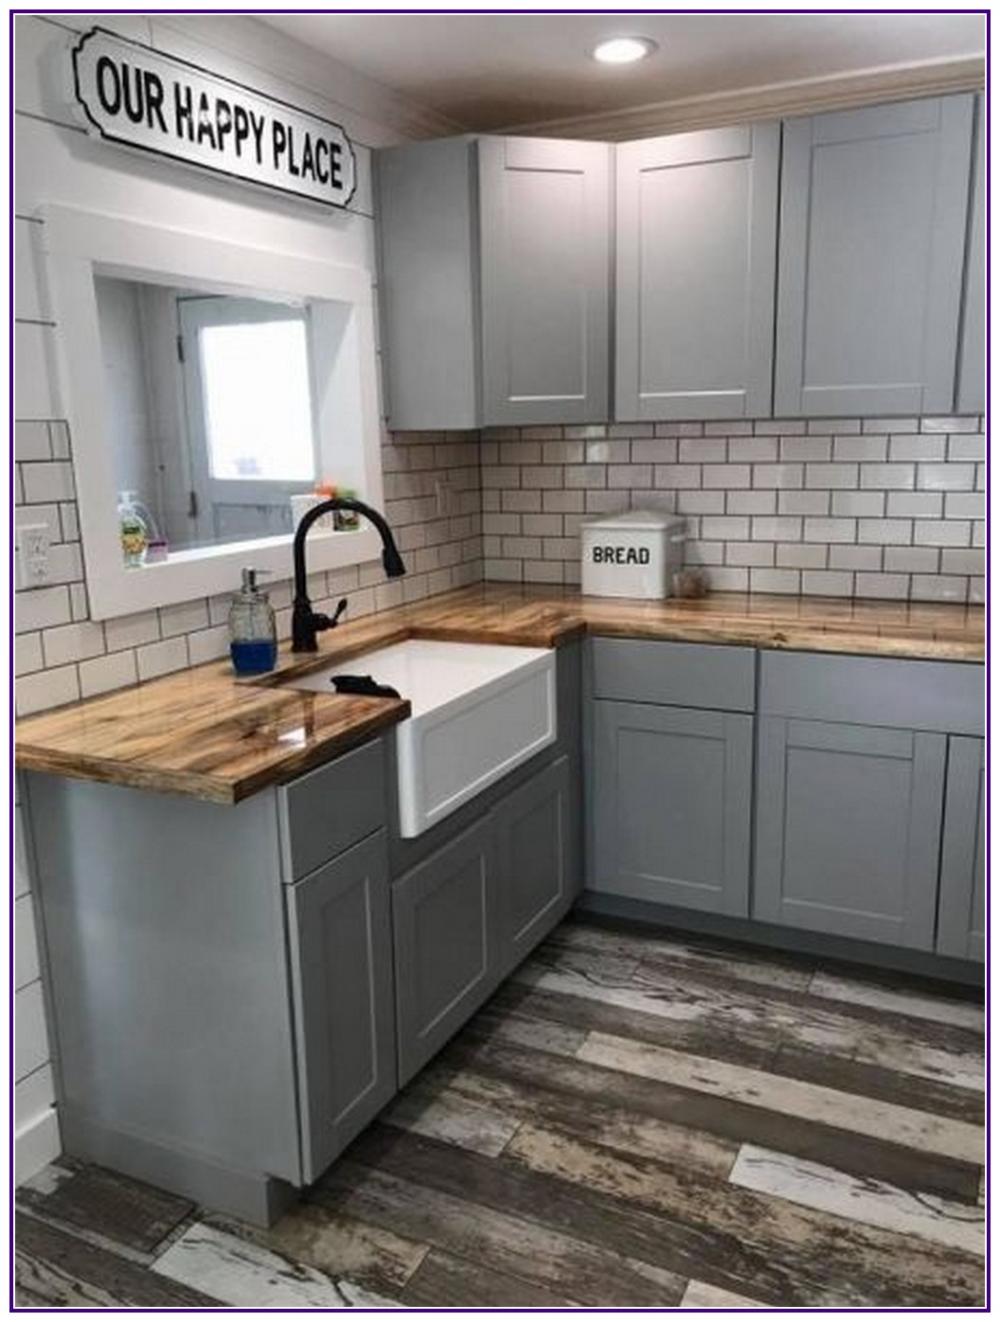 15 Inspiring Kitchen Cabinet That You Must See Aux Pays Des Fleu Kuche Gr 15 Inspiring Ki In 2020 Kitchen Room Design Modern Kitchen Room Diy Kitchen Remodel